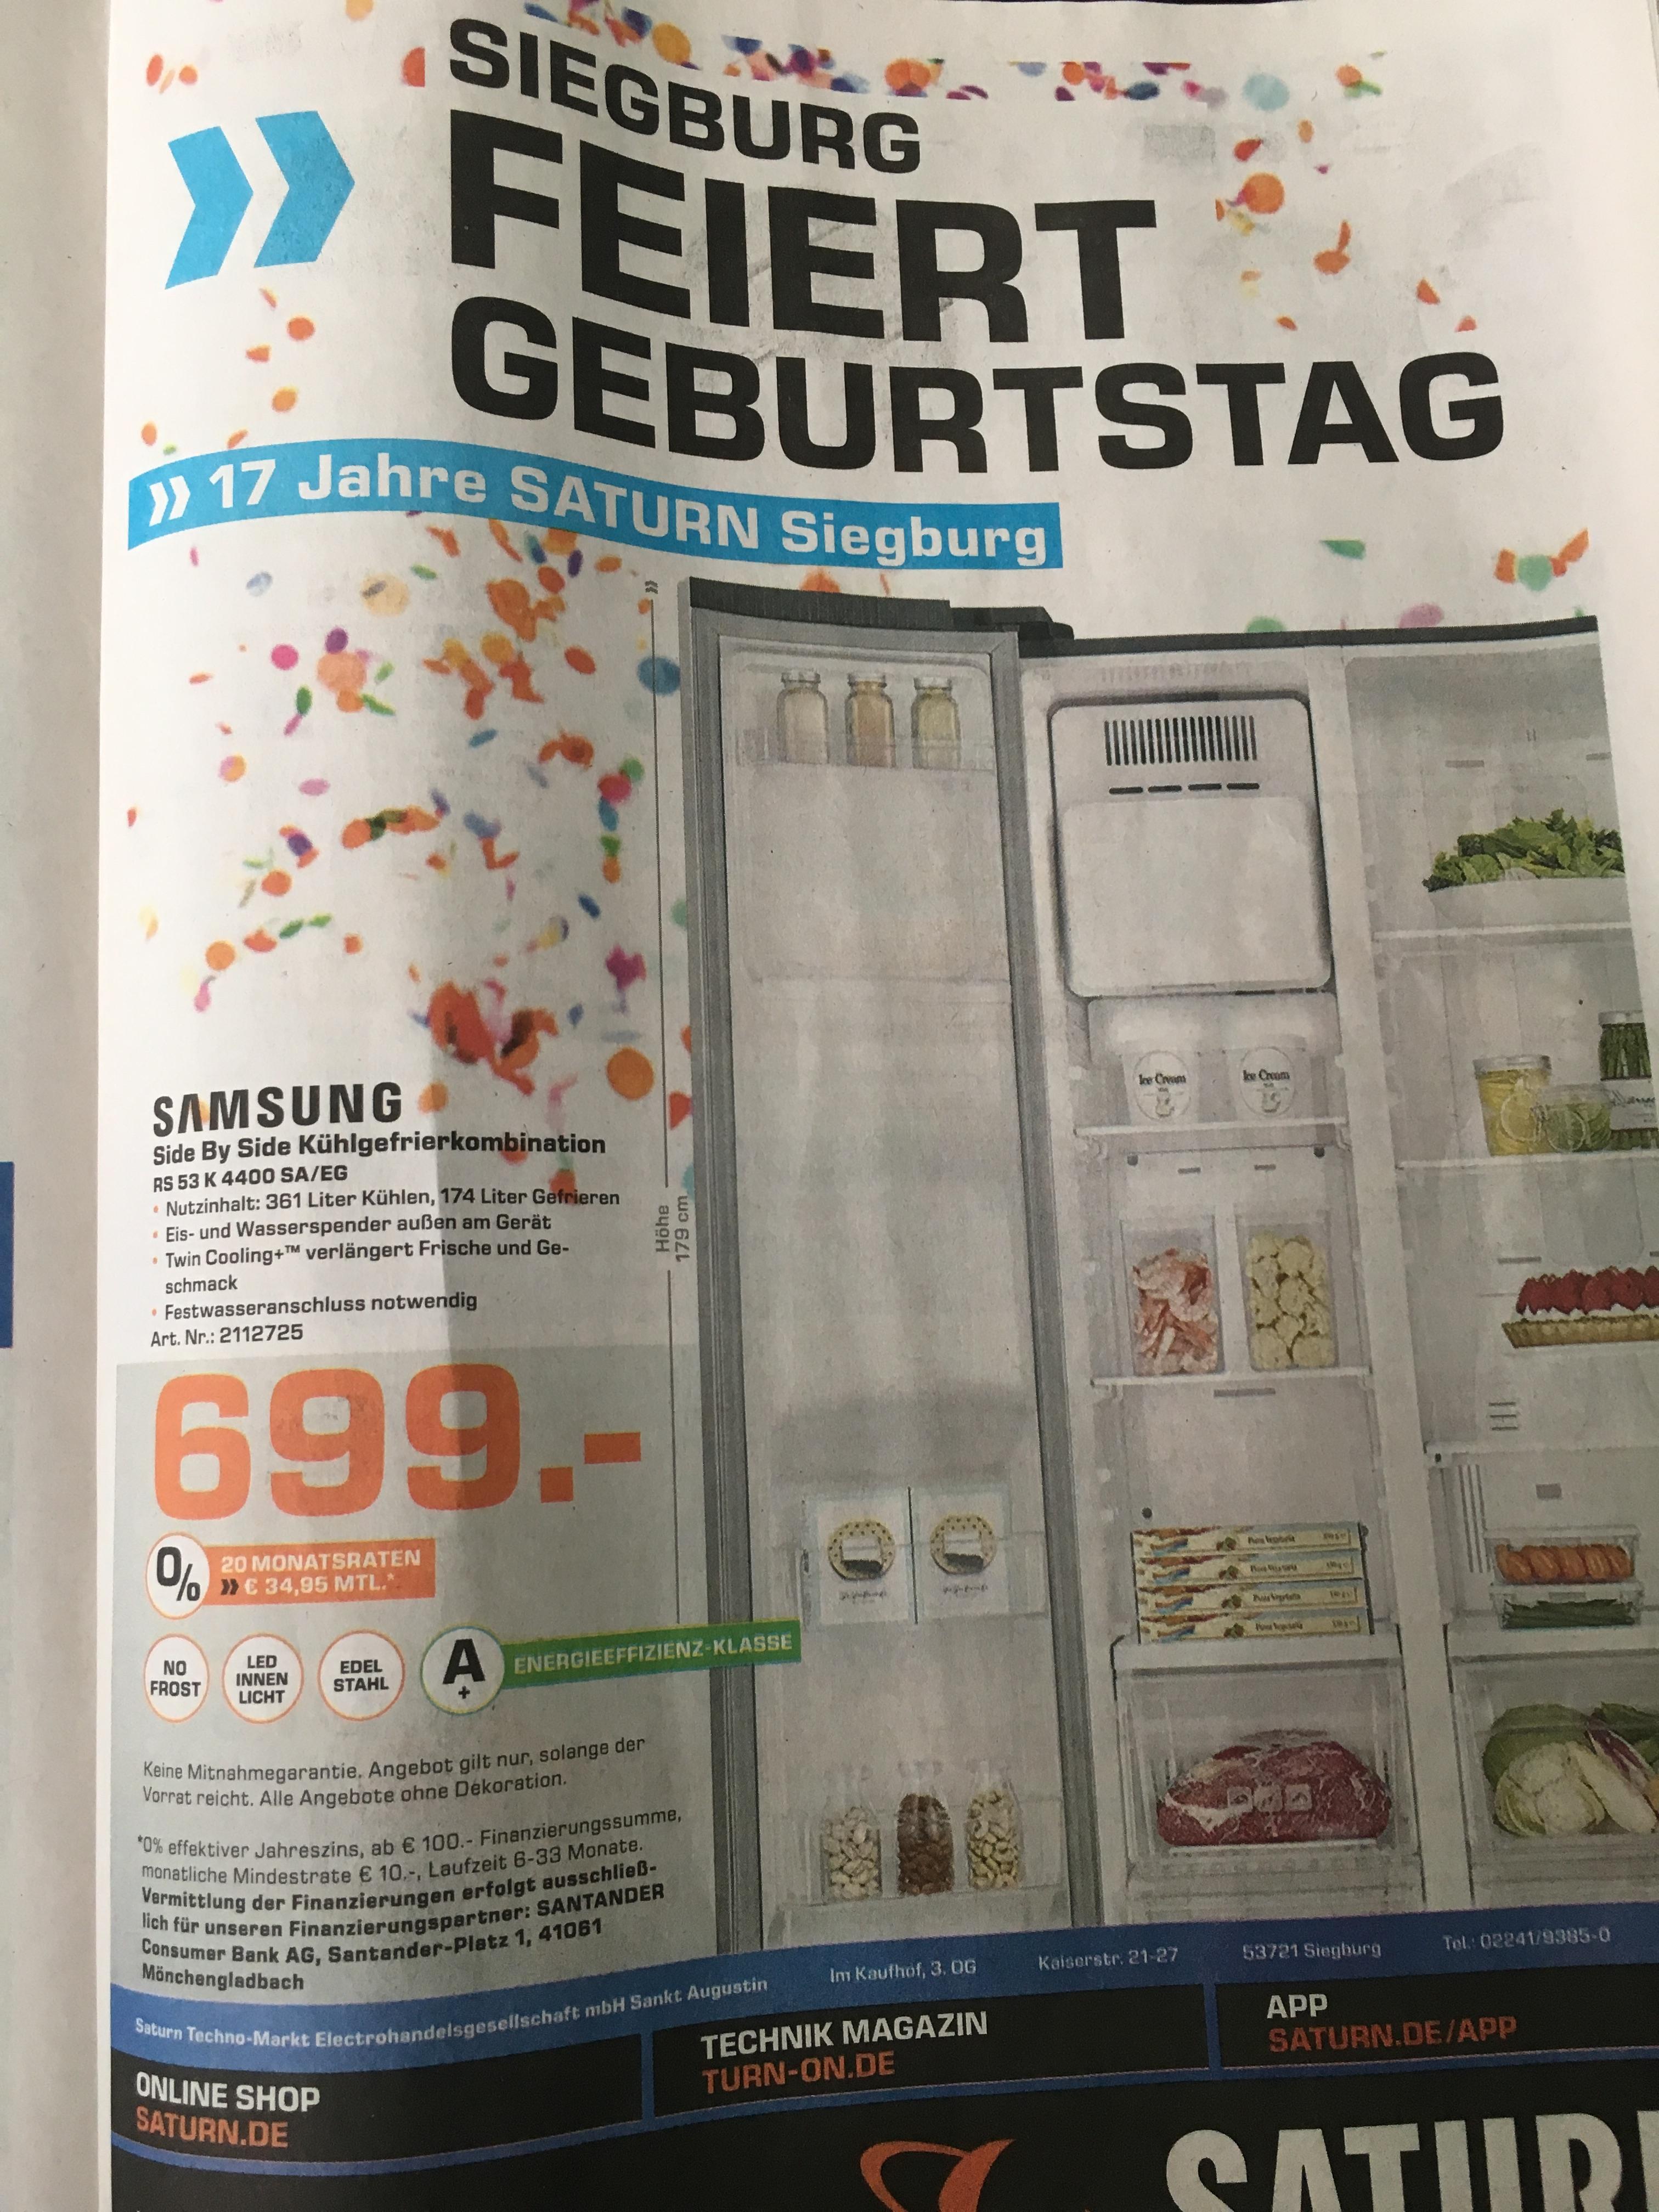 [lokal] 17 Jahre Saturn Siegburg: SidebySide Samsung RS53K4400SA/EG 699€, Waschmaschine Samsung WF70F5E0R4W 269€, Einbauherdset Beko BUM 22323 X 299€, Samsung UE60J6289 666€ & UE50J6289 444€, Logitech MX Master & G430 je 35€ & Samsung Tab S2 349€!